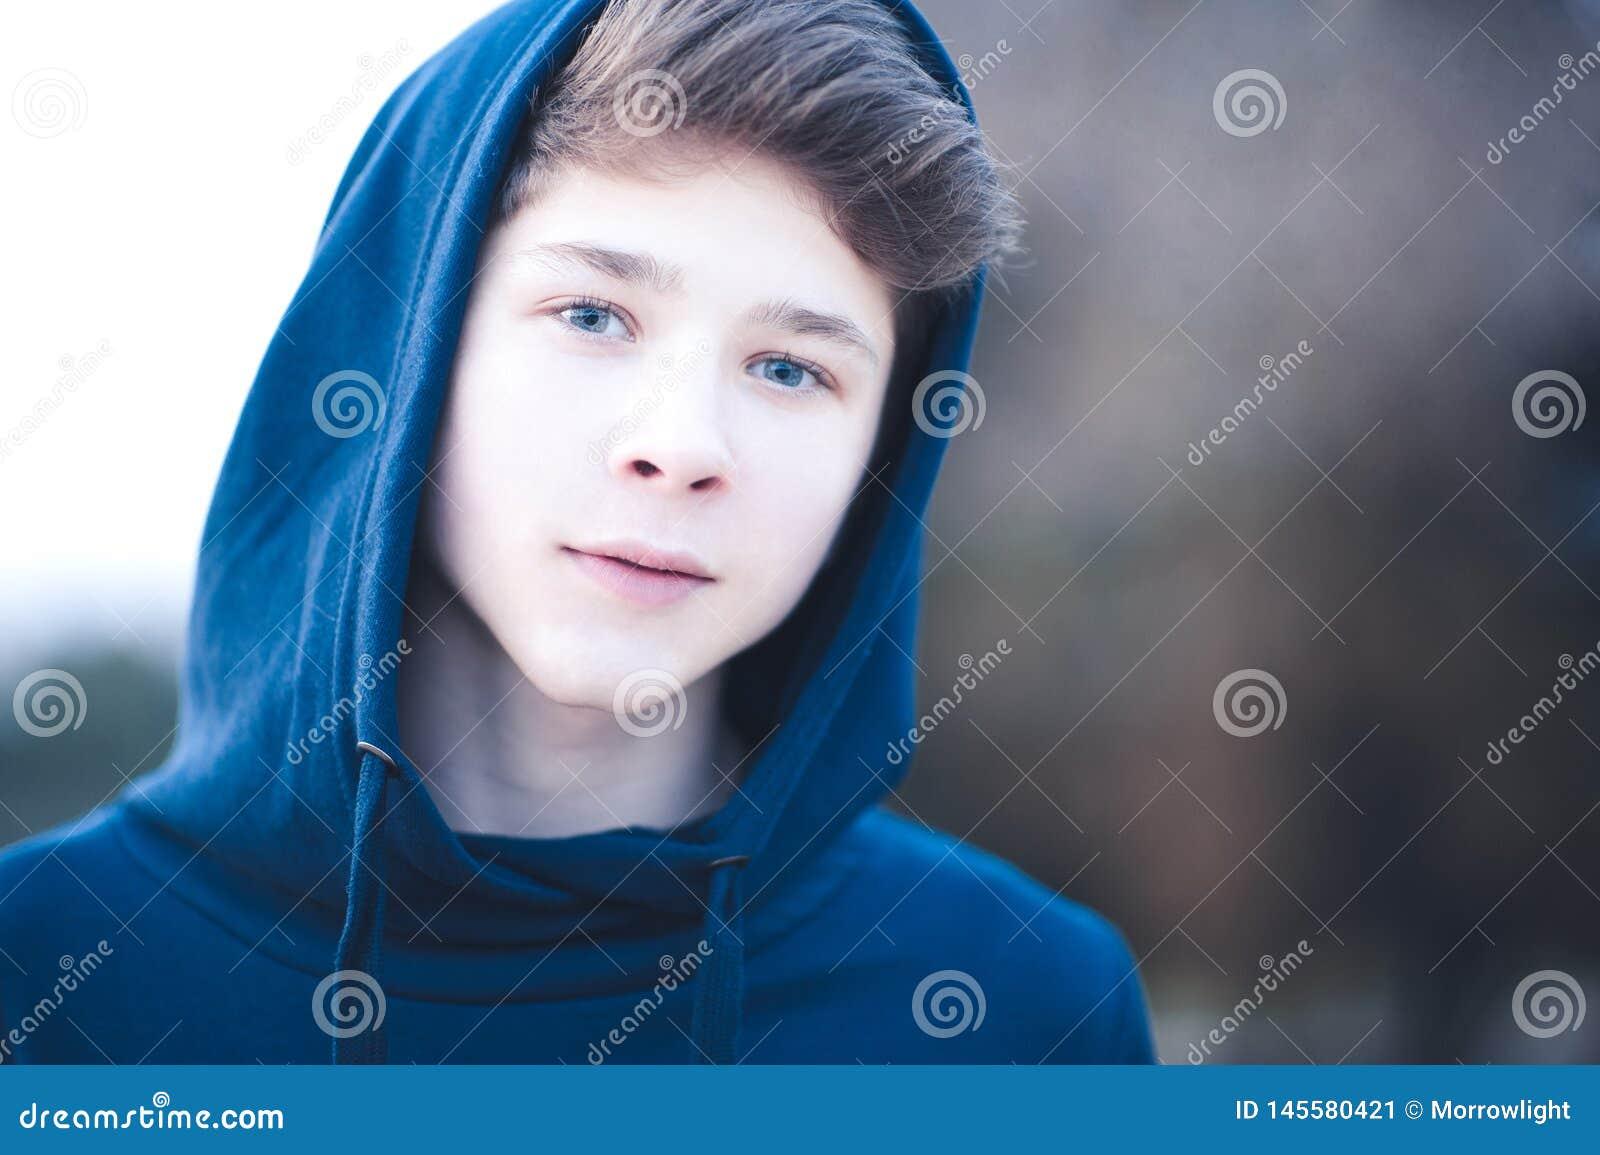 Teen Boy Outdoors Stock Image Image Of Hoodie Cool 145580421